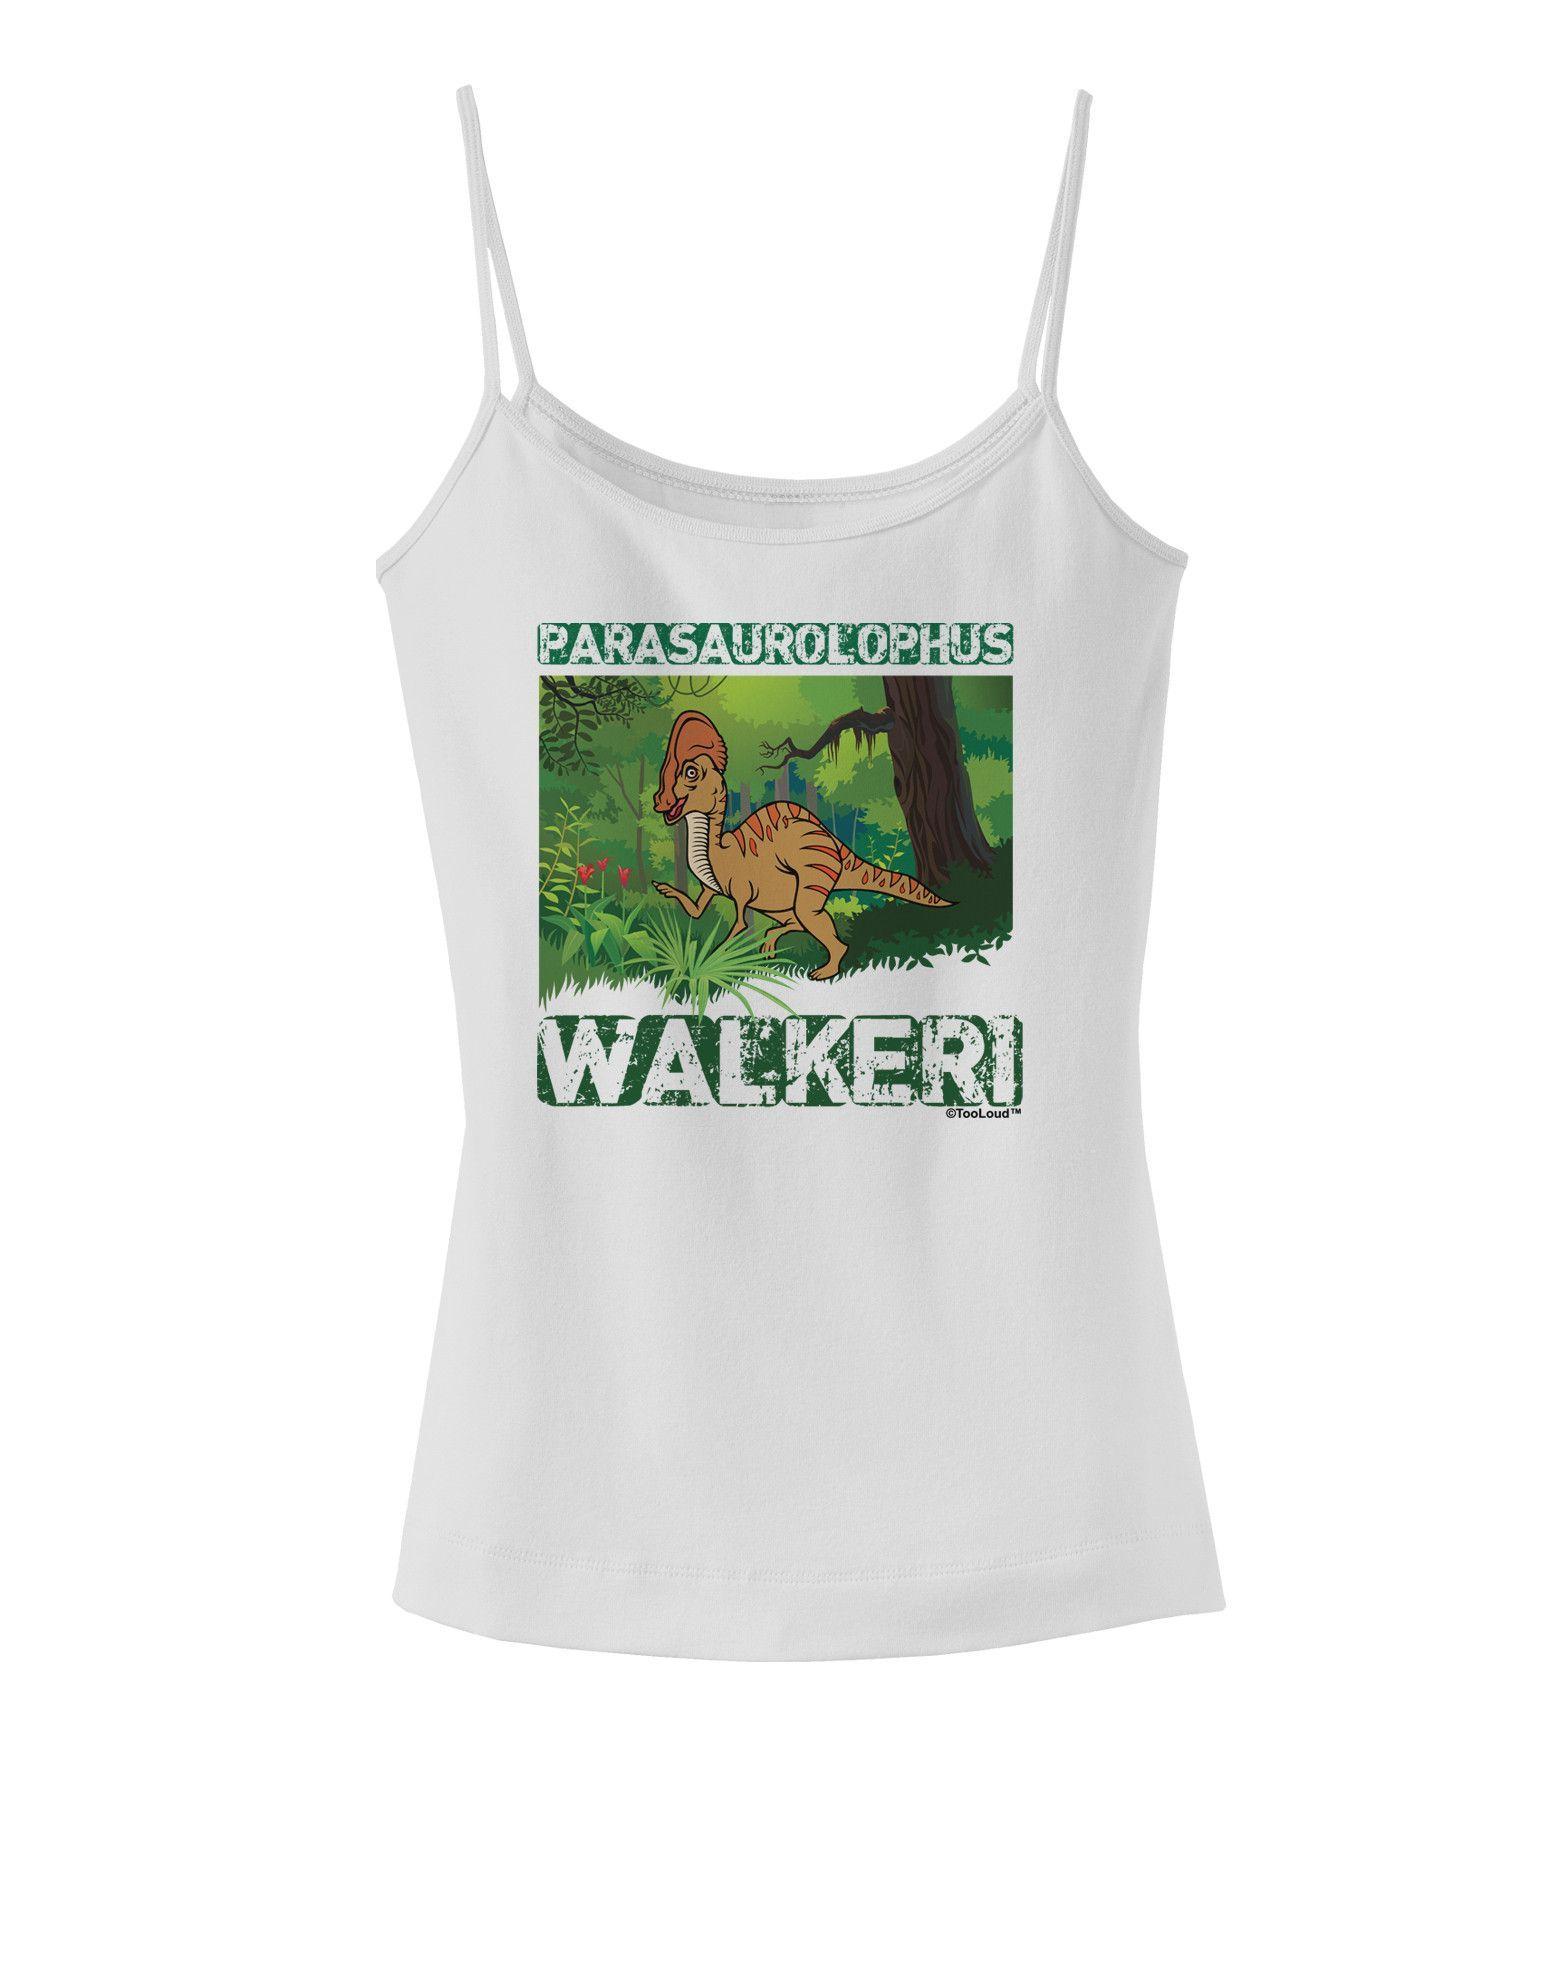 TooLoud Parasaurolophus Walkeri with Name Dark Muscle Shirt